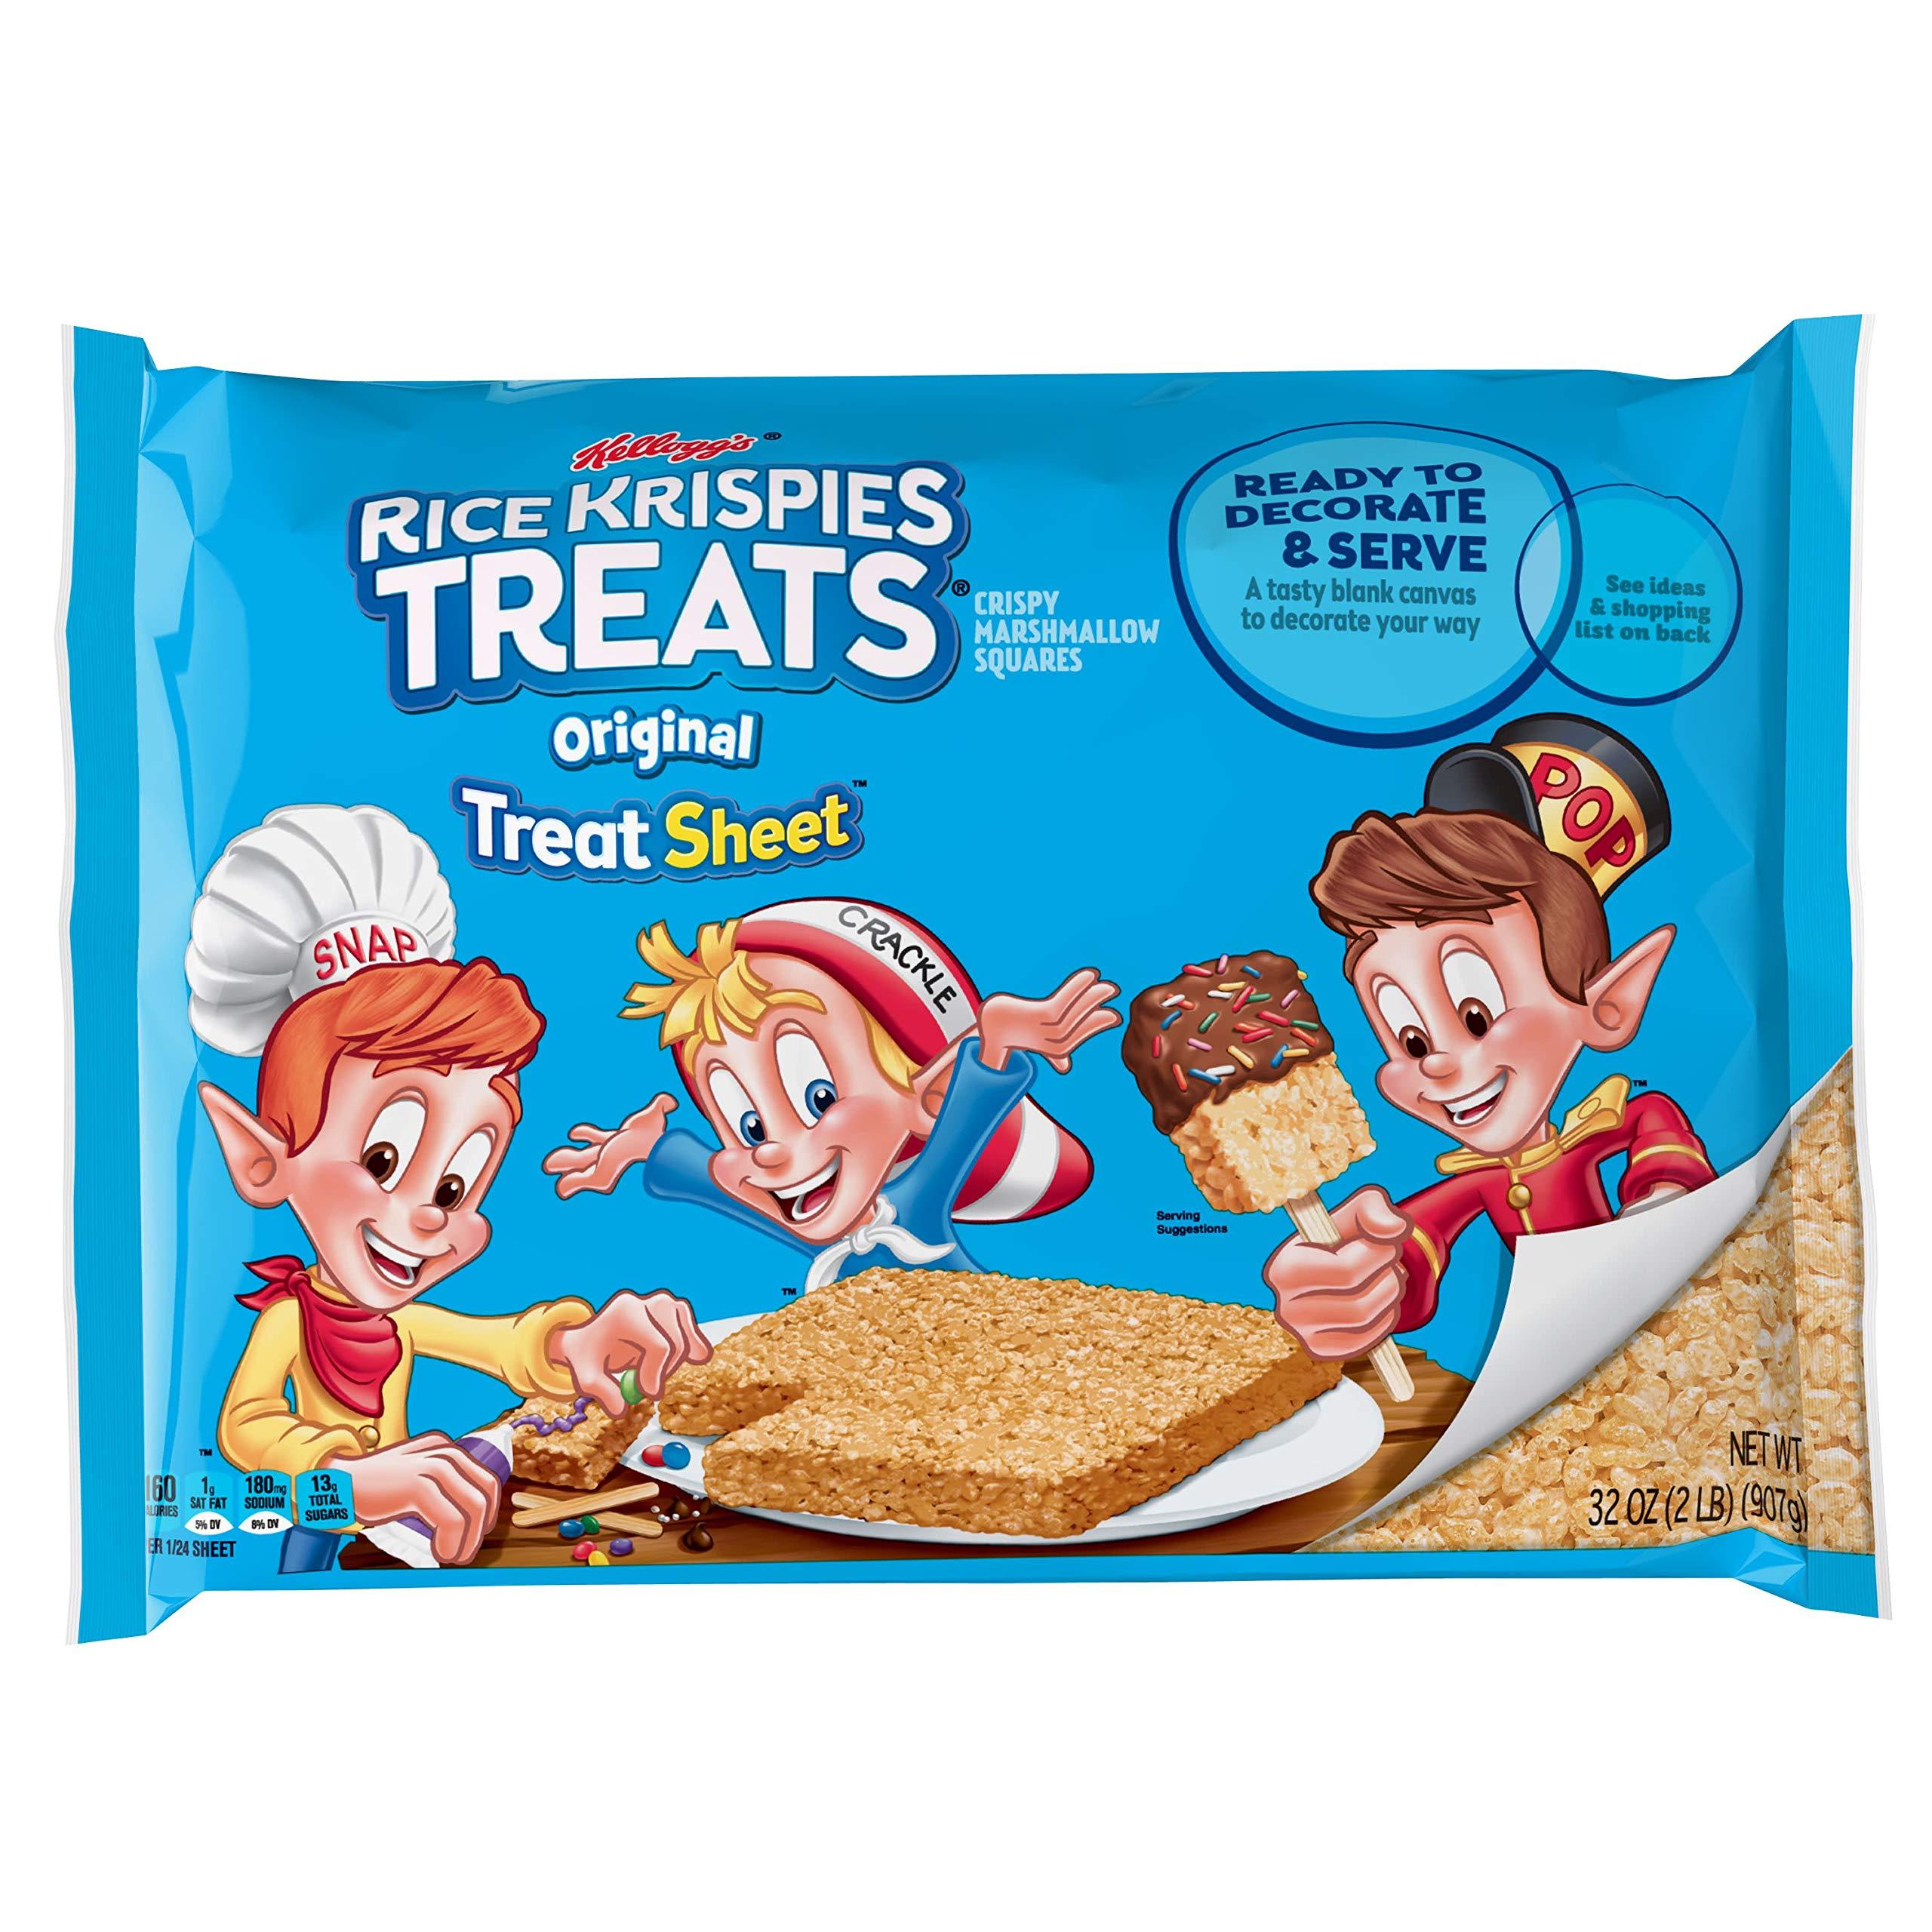 Kellogg's Rice Krispies Treats, Crispy Marshmallow Squares, Original, Fun Sheet, 32 oz Sheet by Rice Krispies